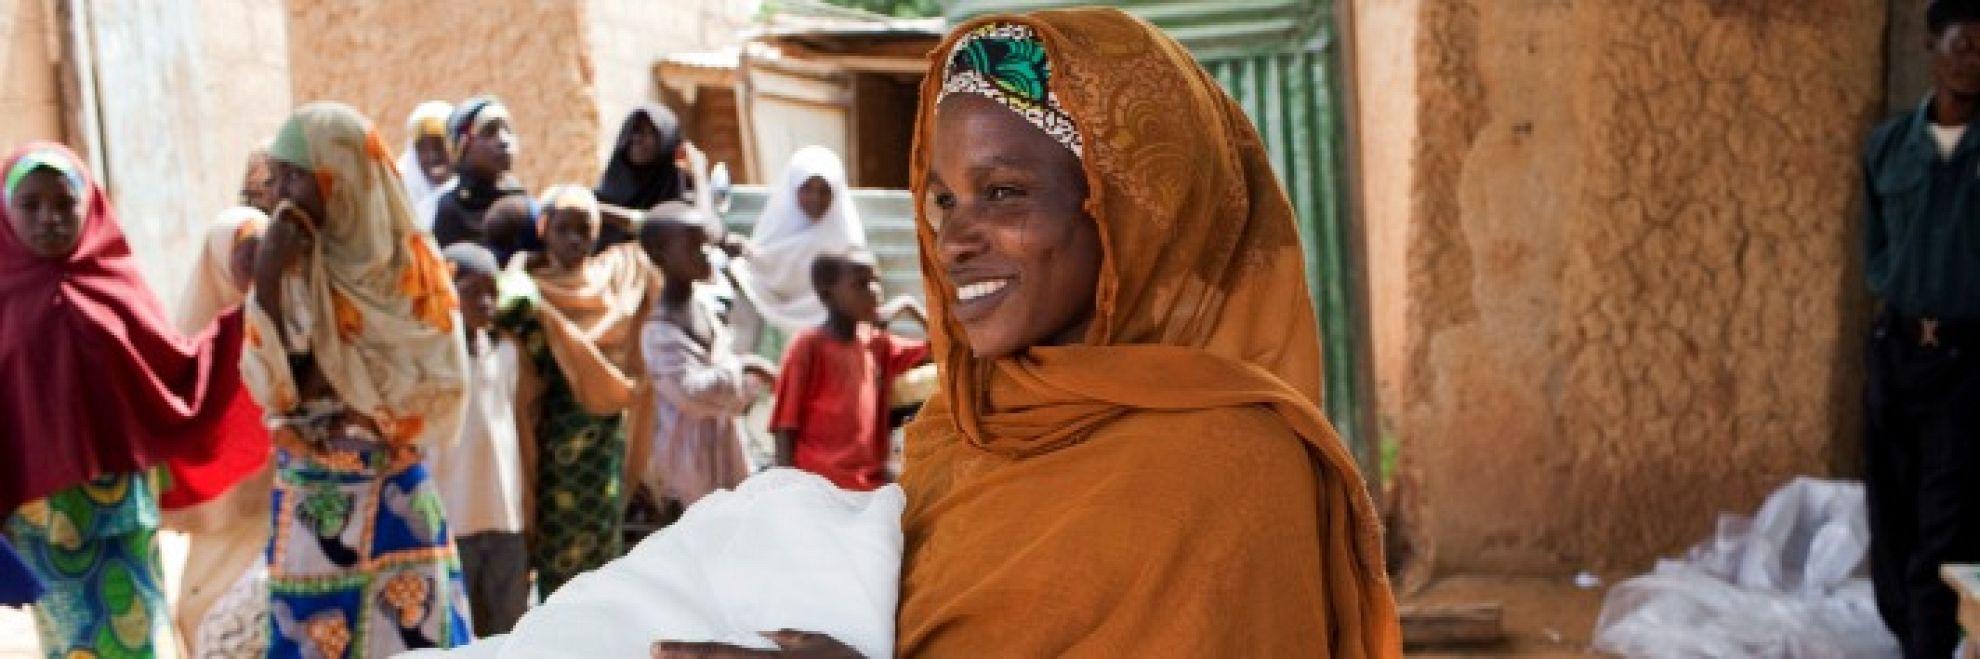 Latest News Malaria consortium calls for an increase in malaria funding